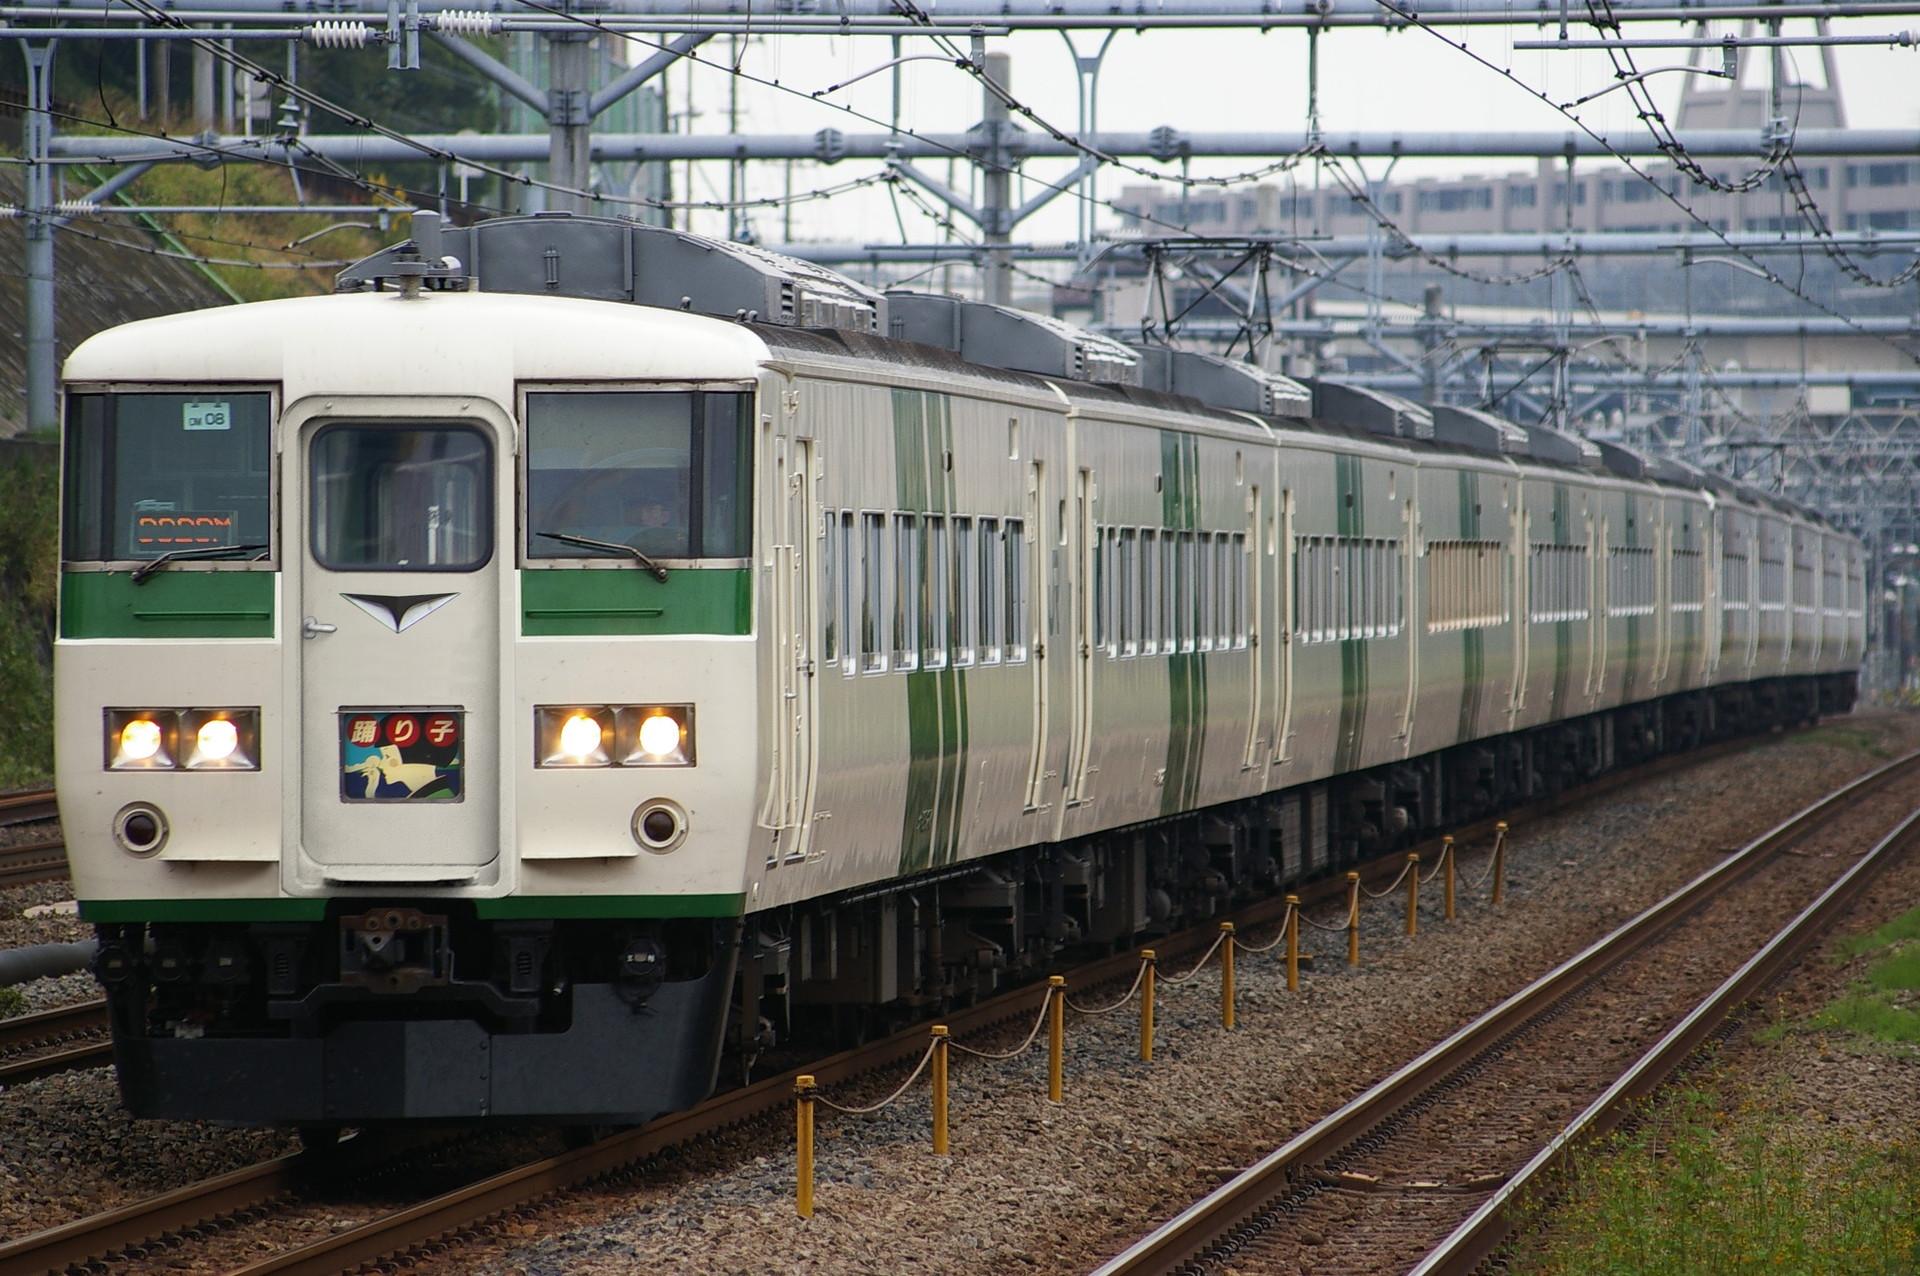 ウソ電 185系電車 貫通型